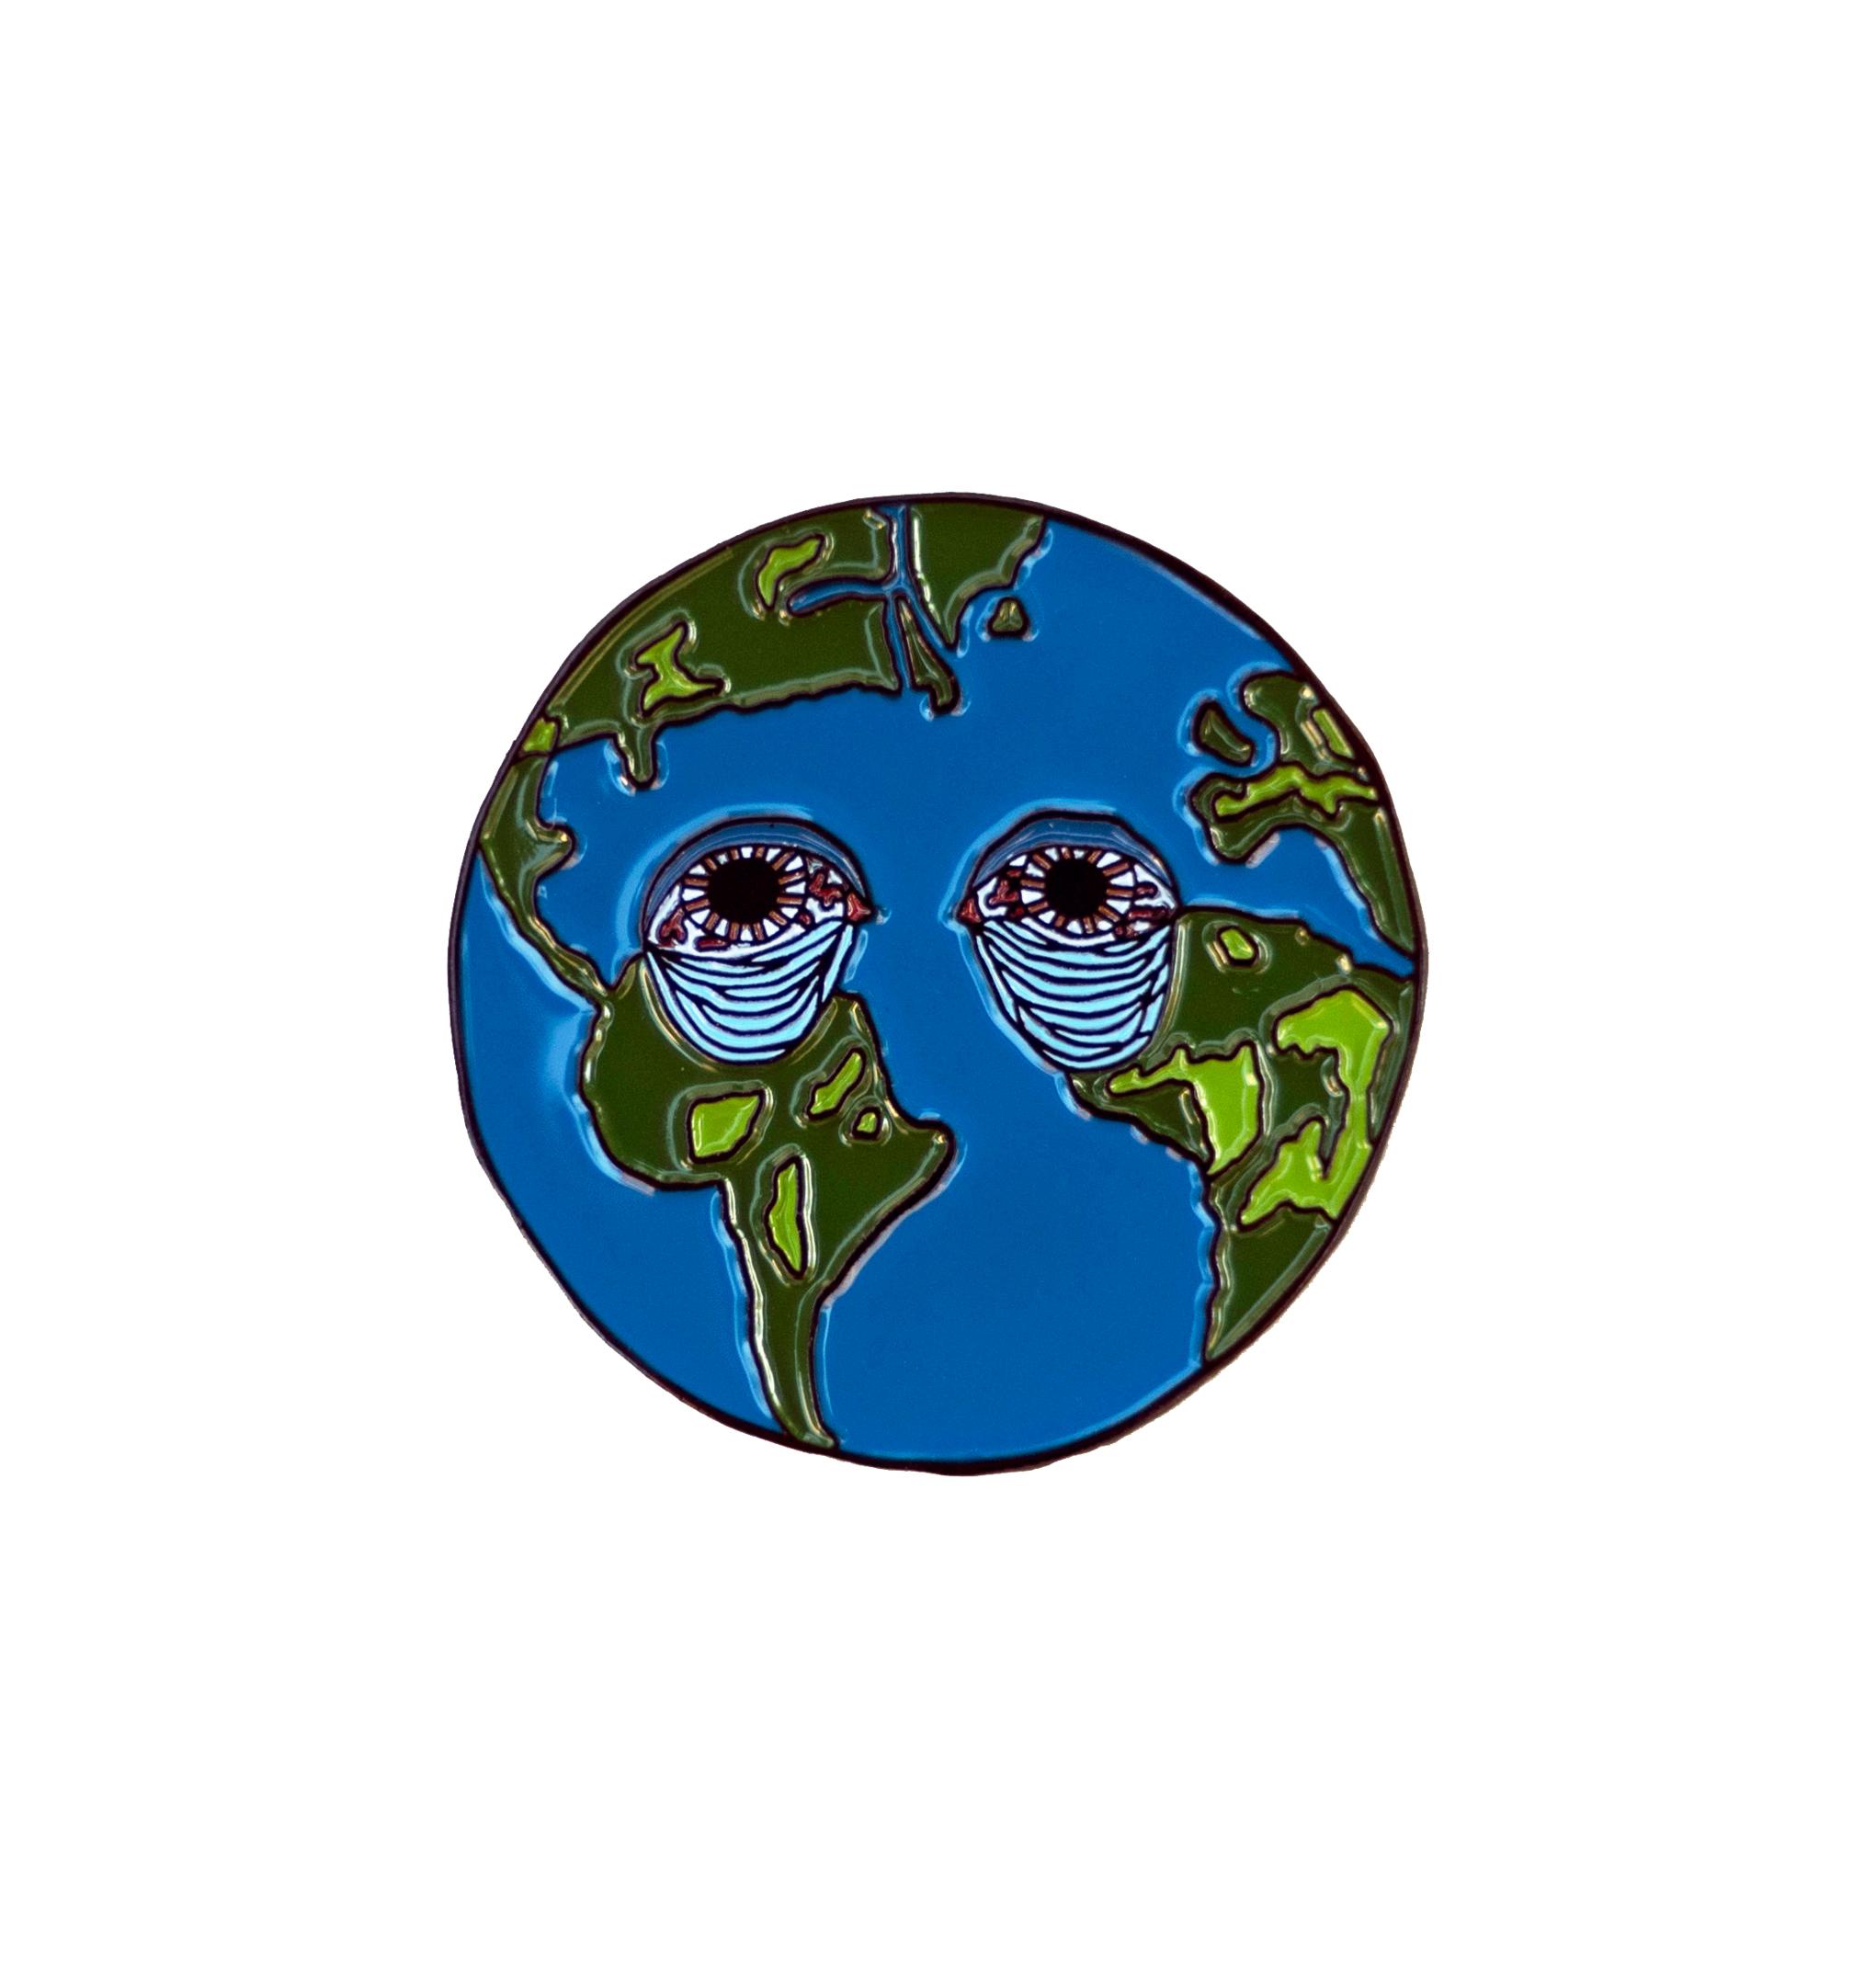 Sad Earth Enamel Pin  $10 (U.S. shipping included)